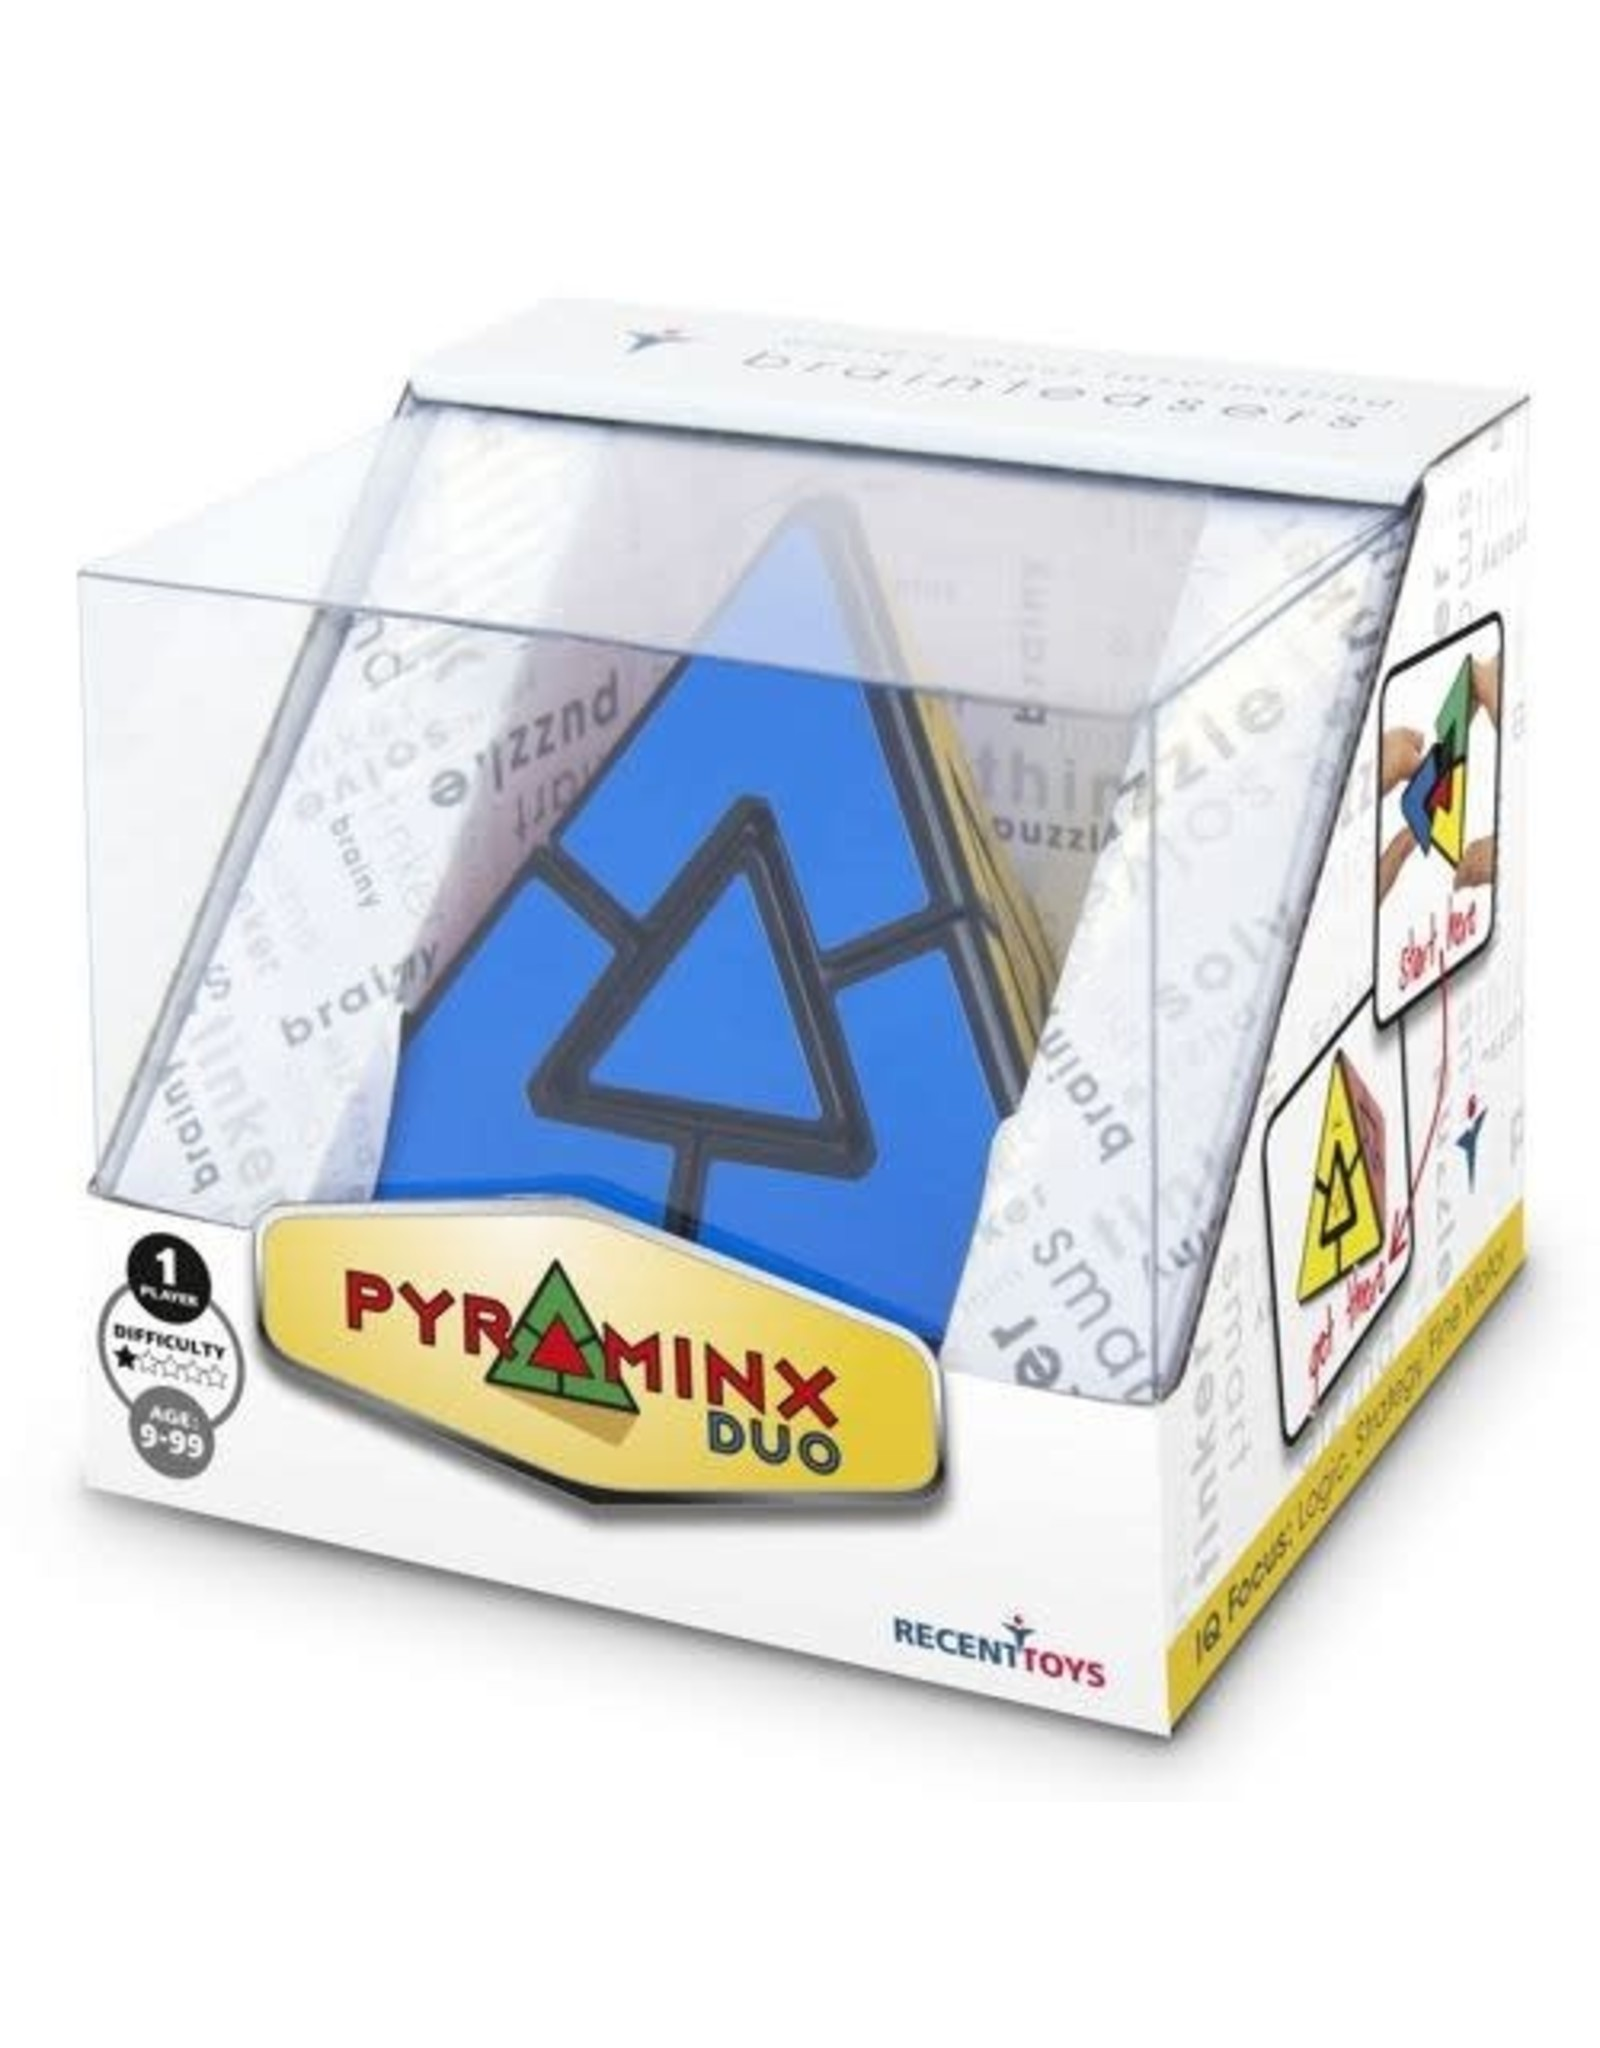 Recent Toys Pyraminx Duo Brainpuzzel